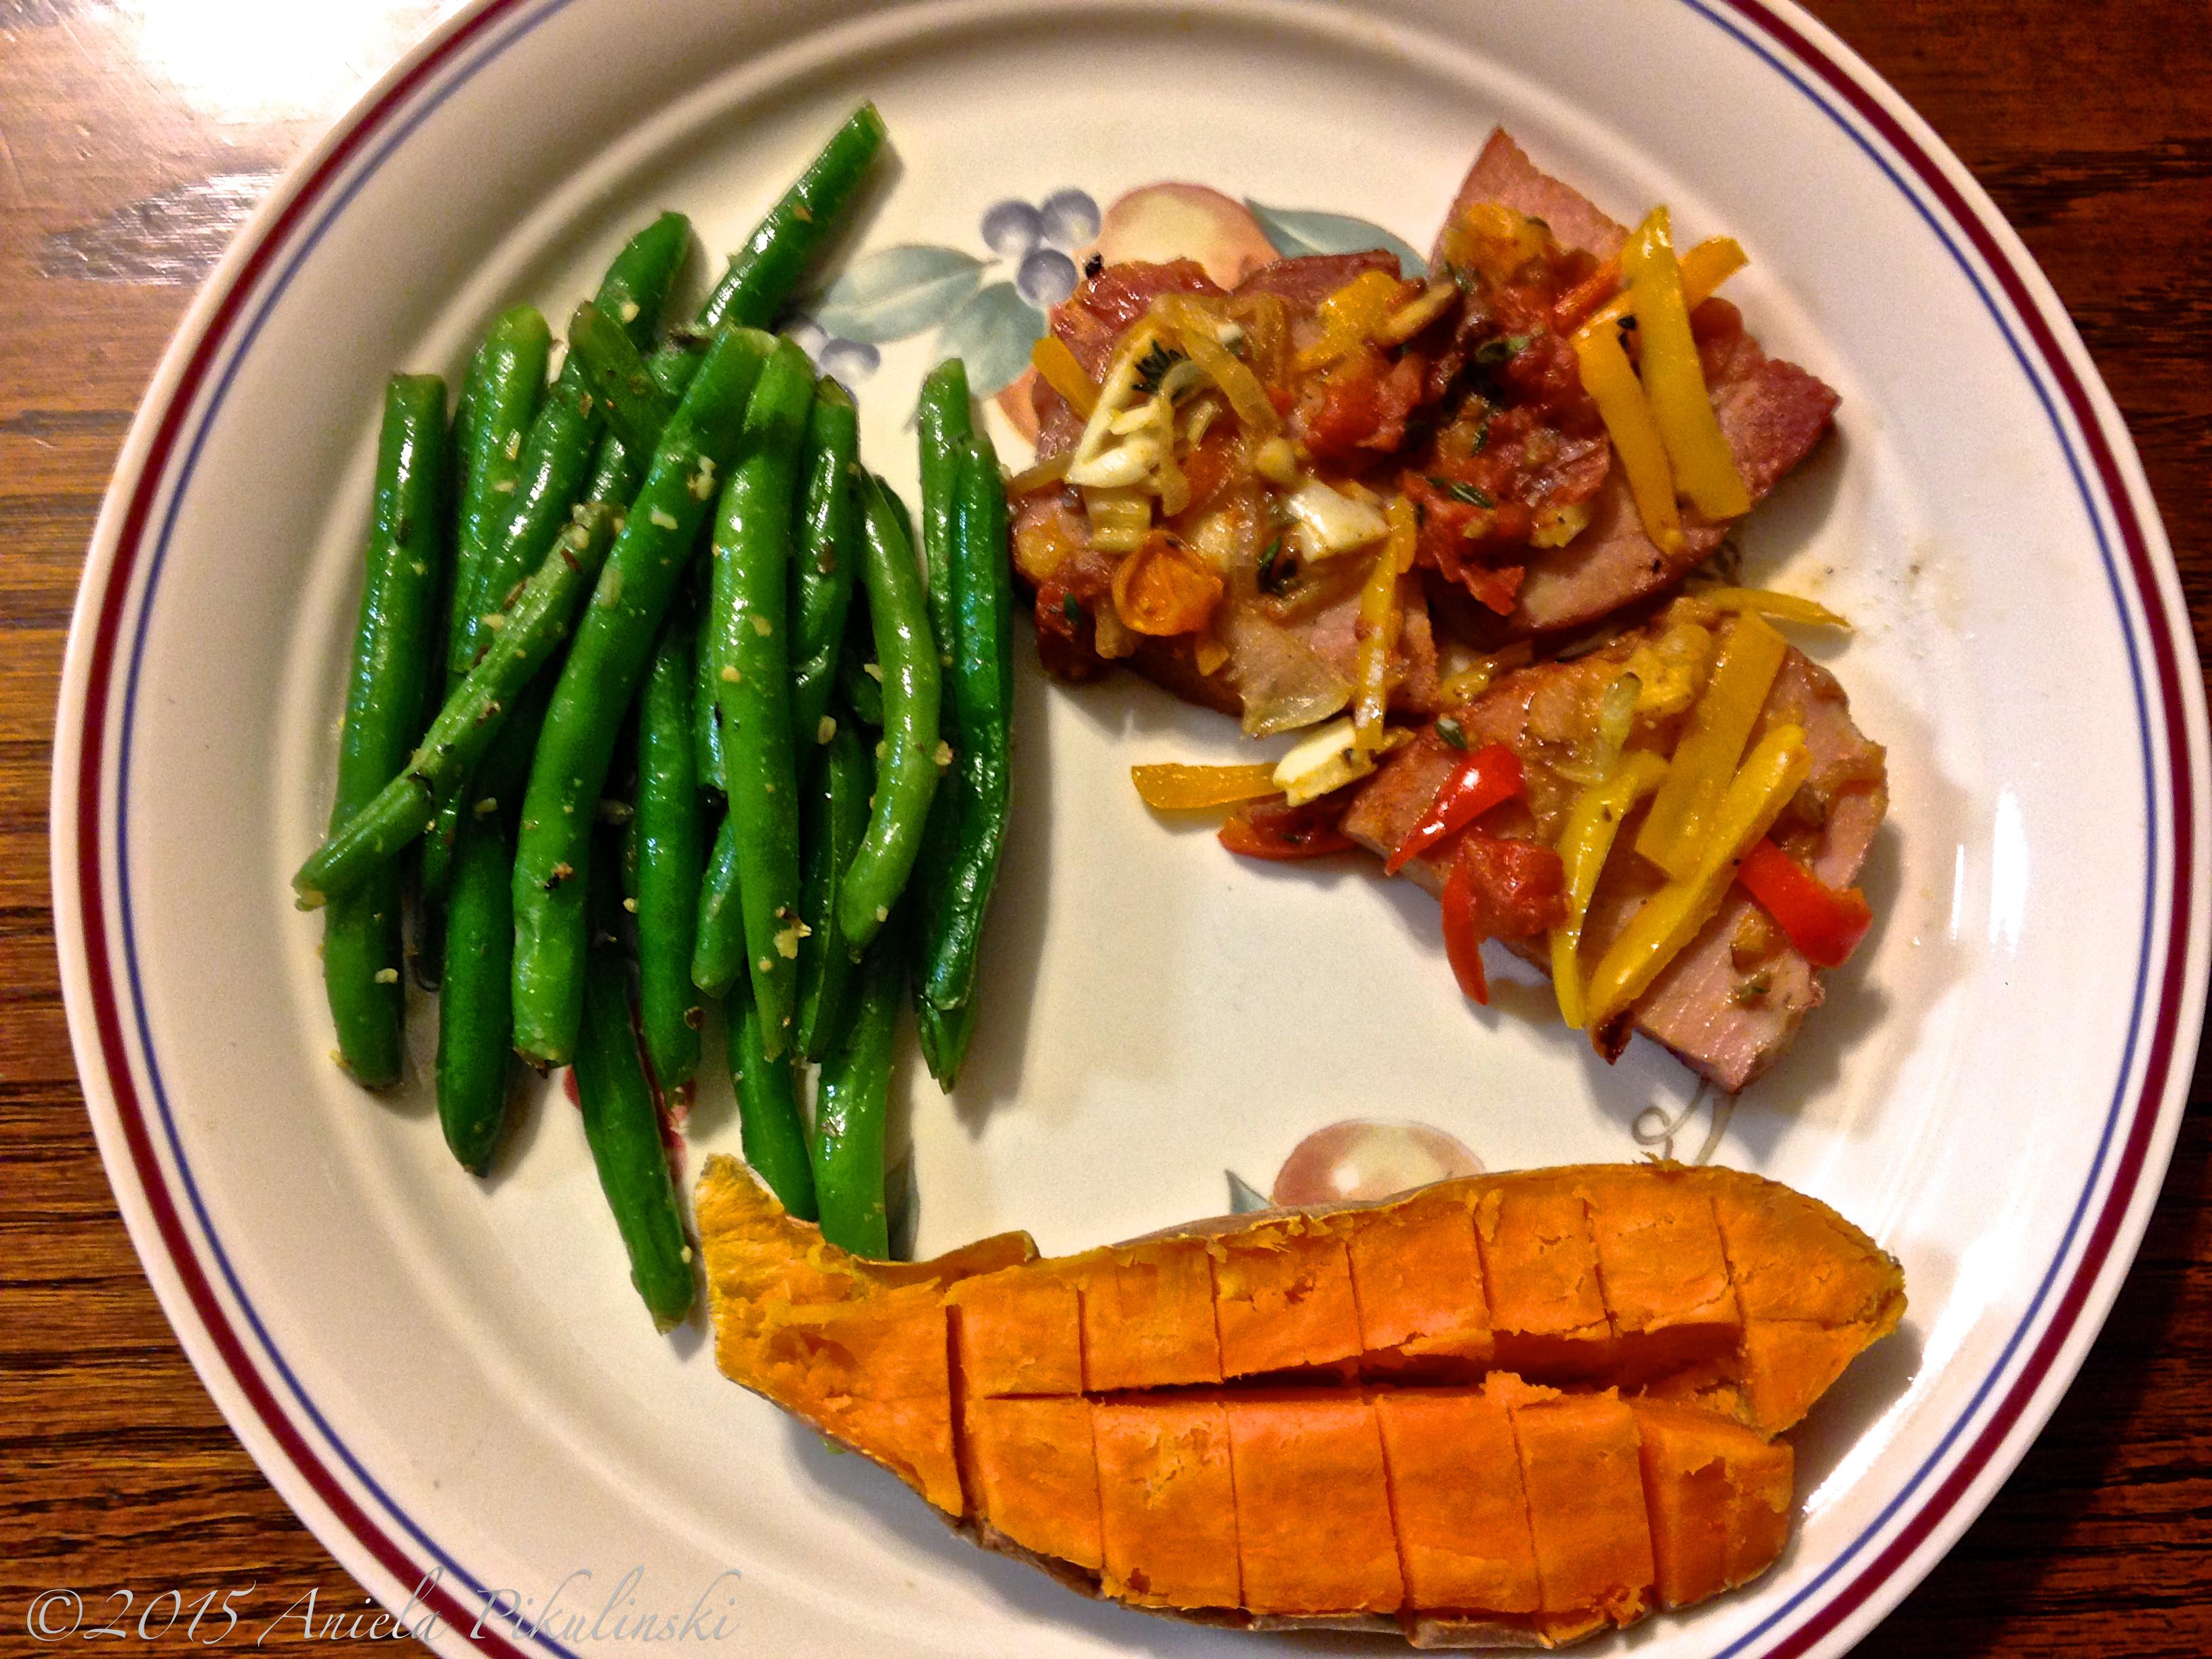 Vegetables For Easter Dinner  Sliced Ham with Sautéed Ve ables Life with Aniela